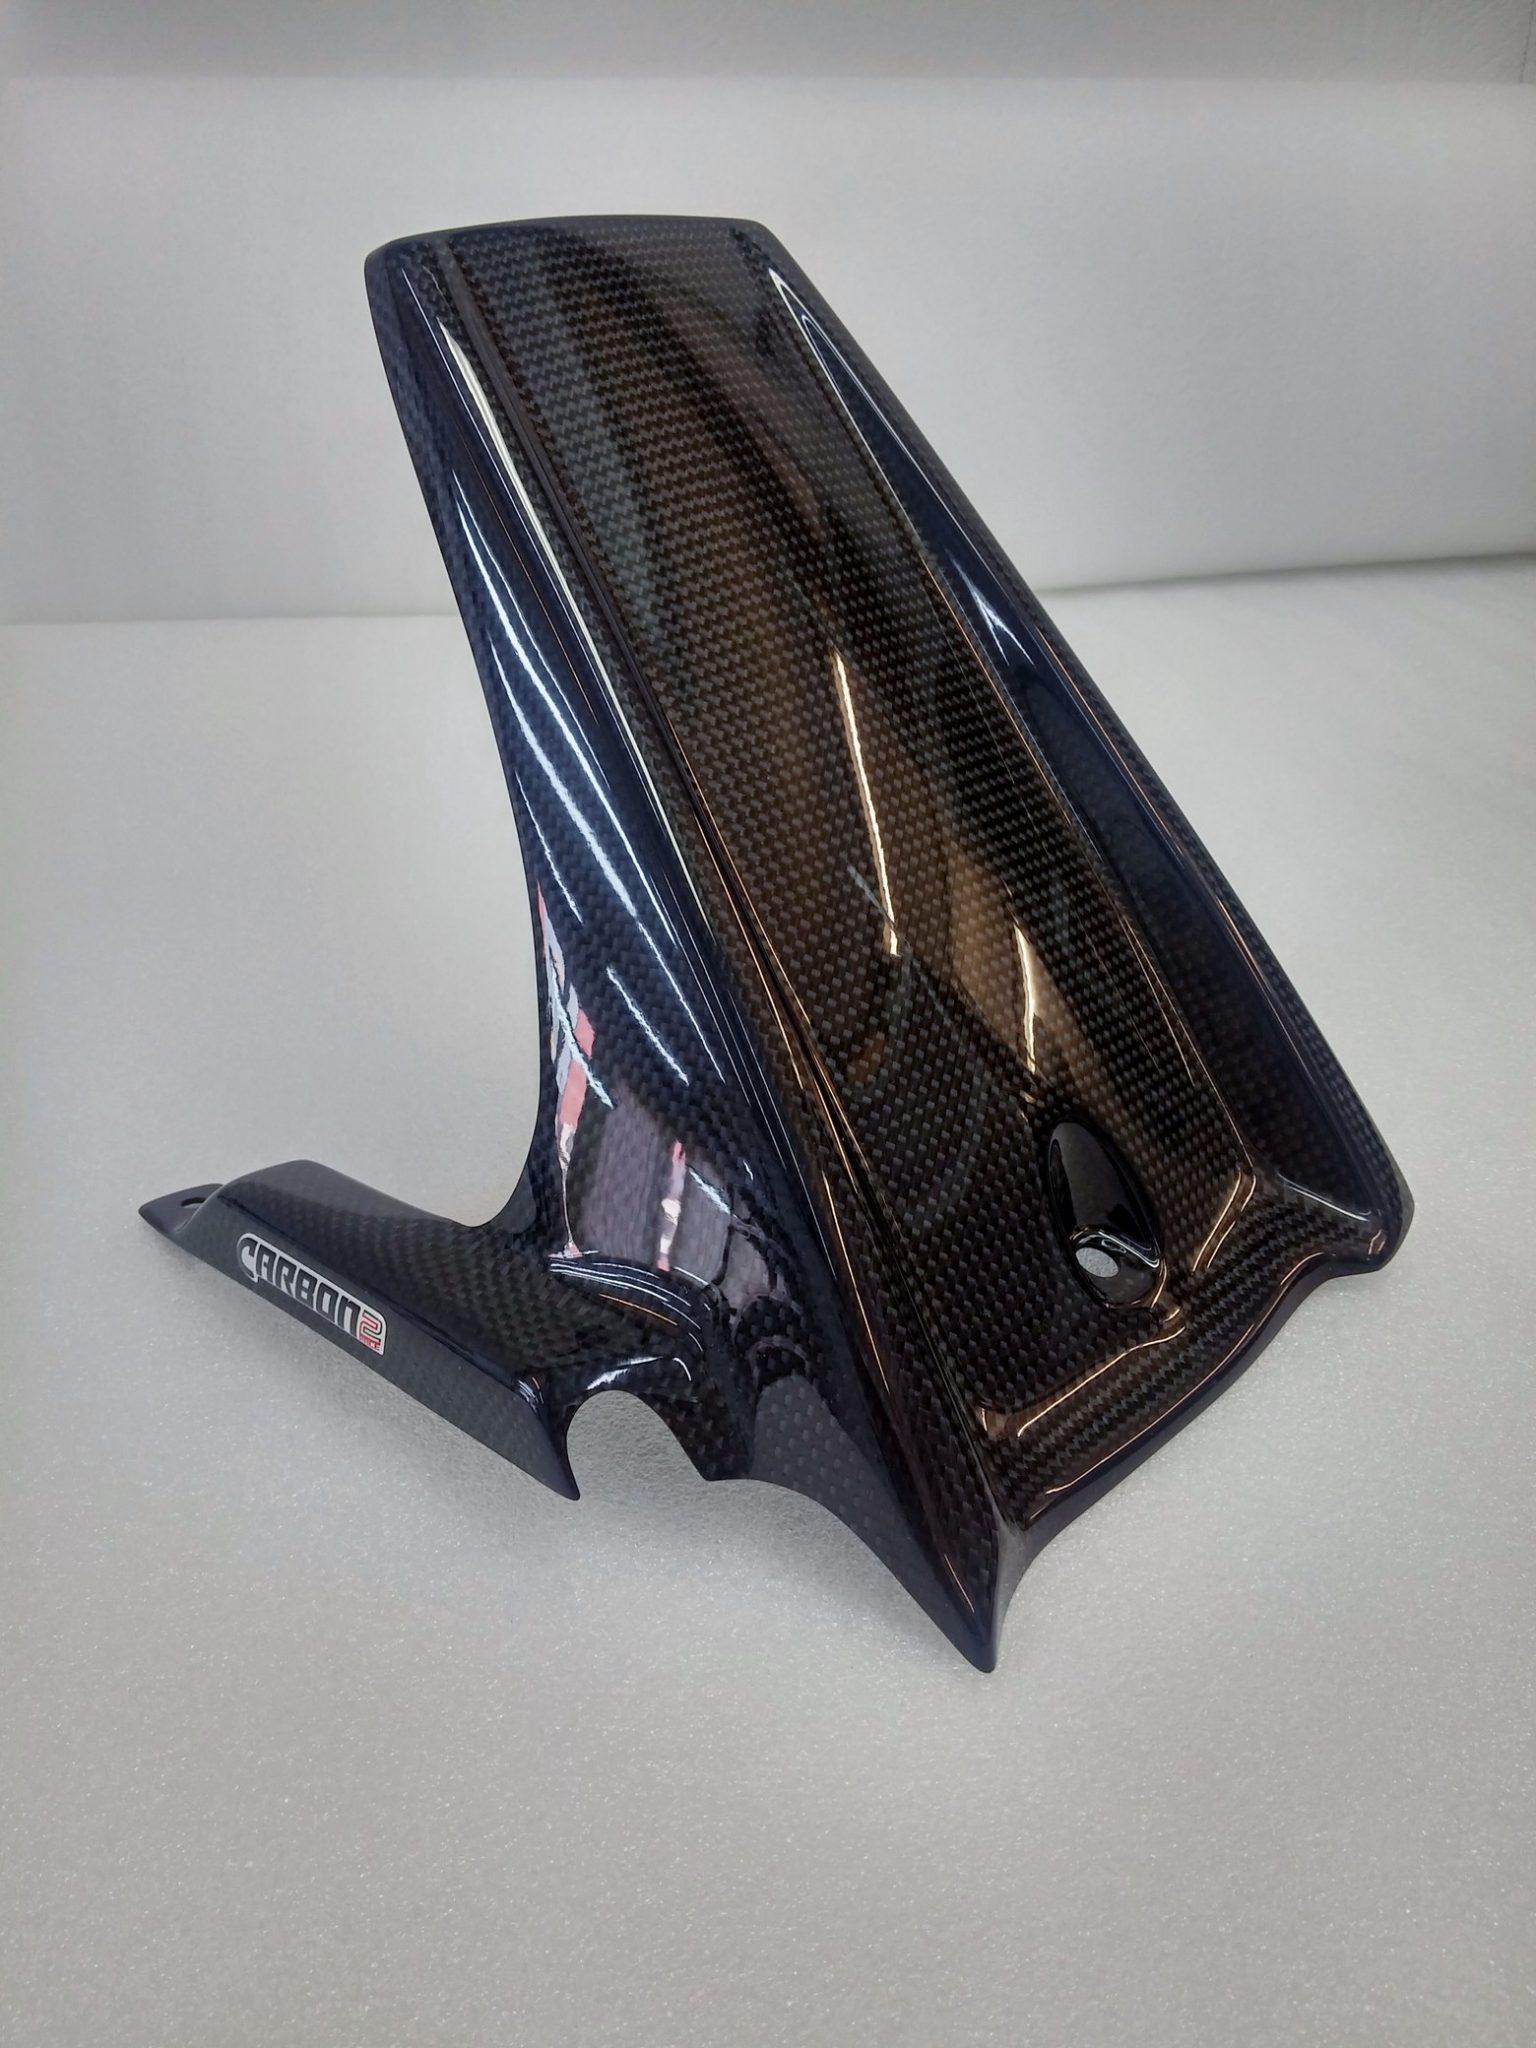 KAWASAKI ZX-10R 2011-2016 Carbon Fiber Rear Fender Extended 1